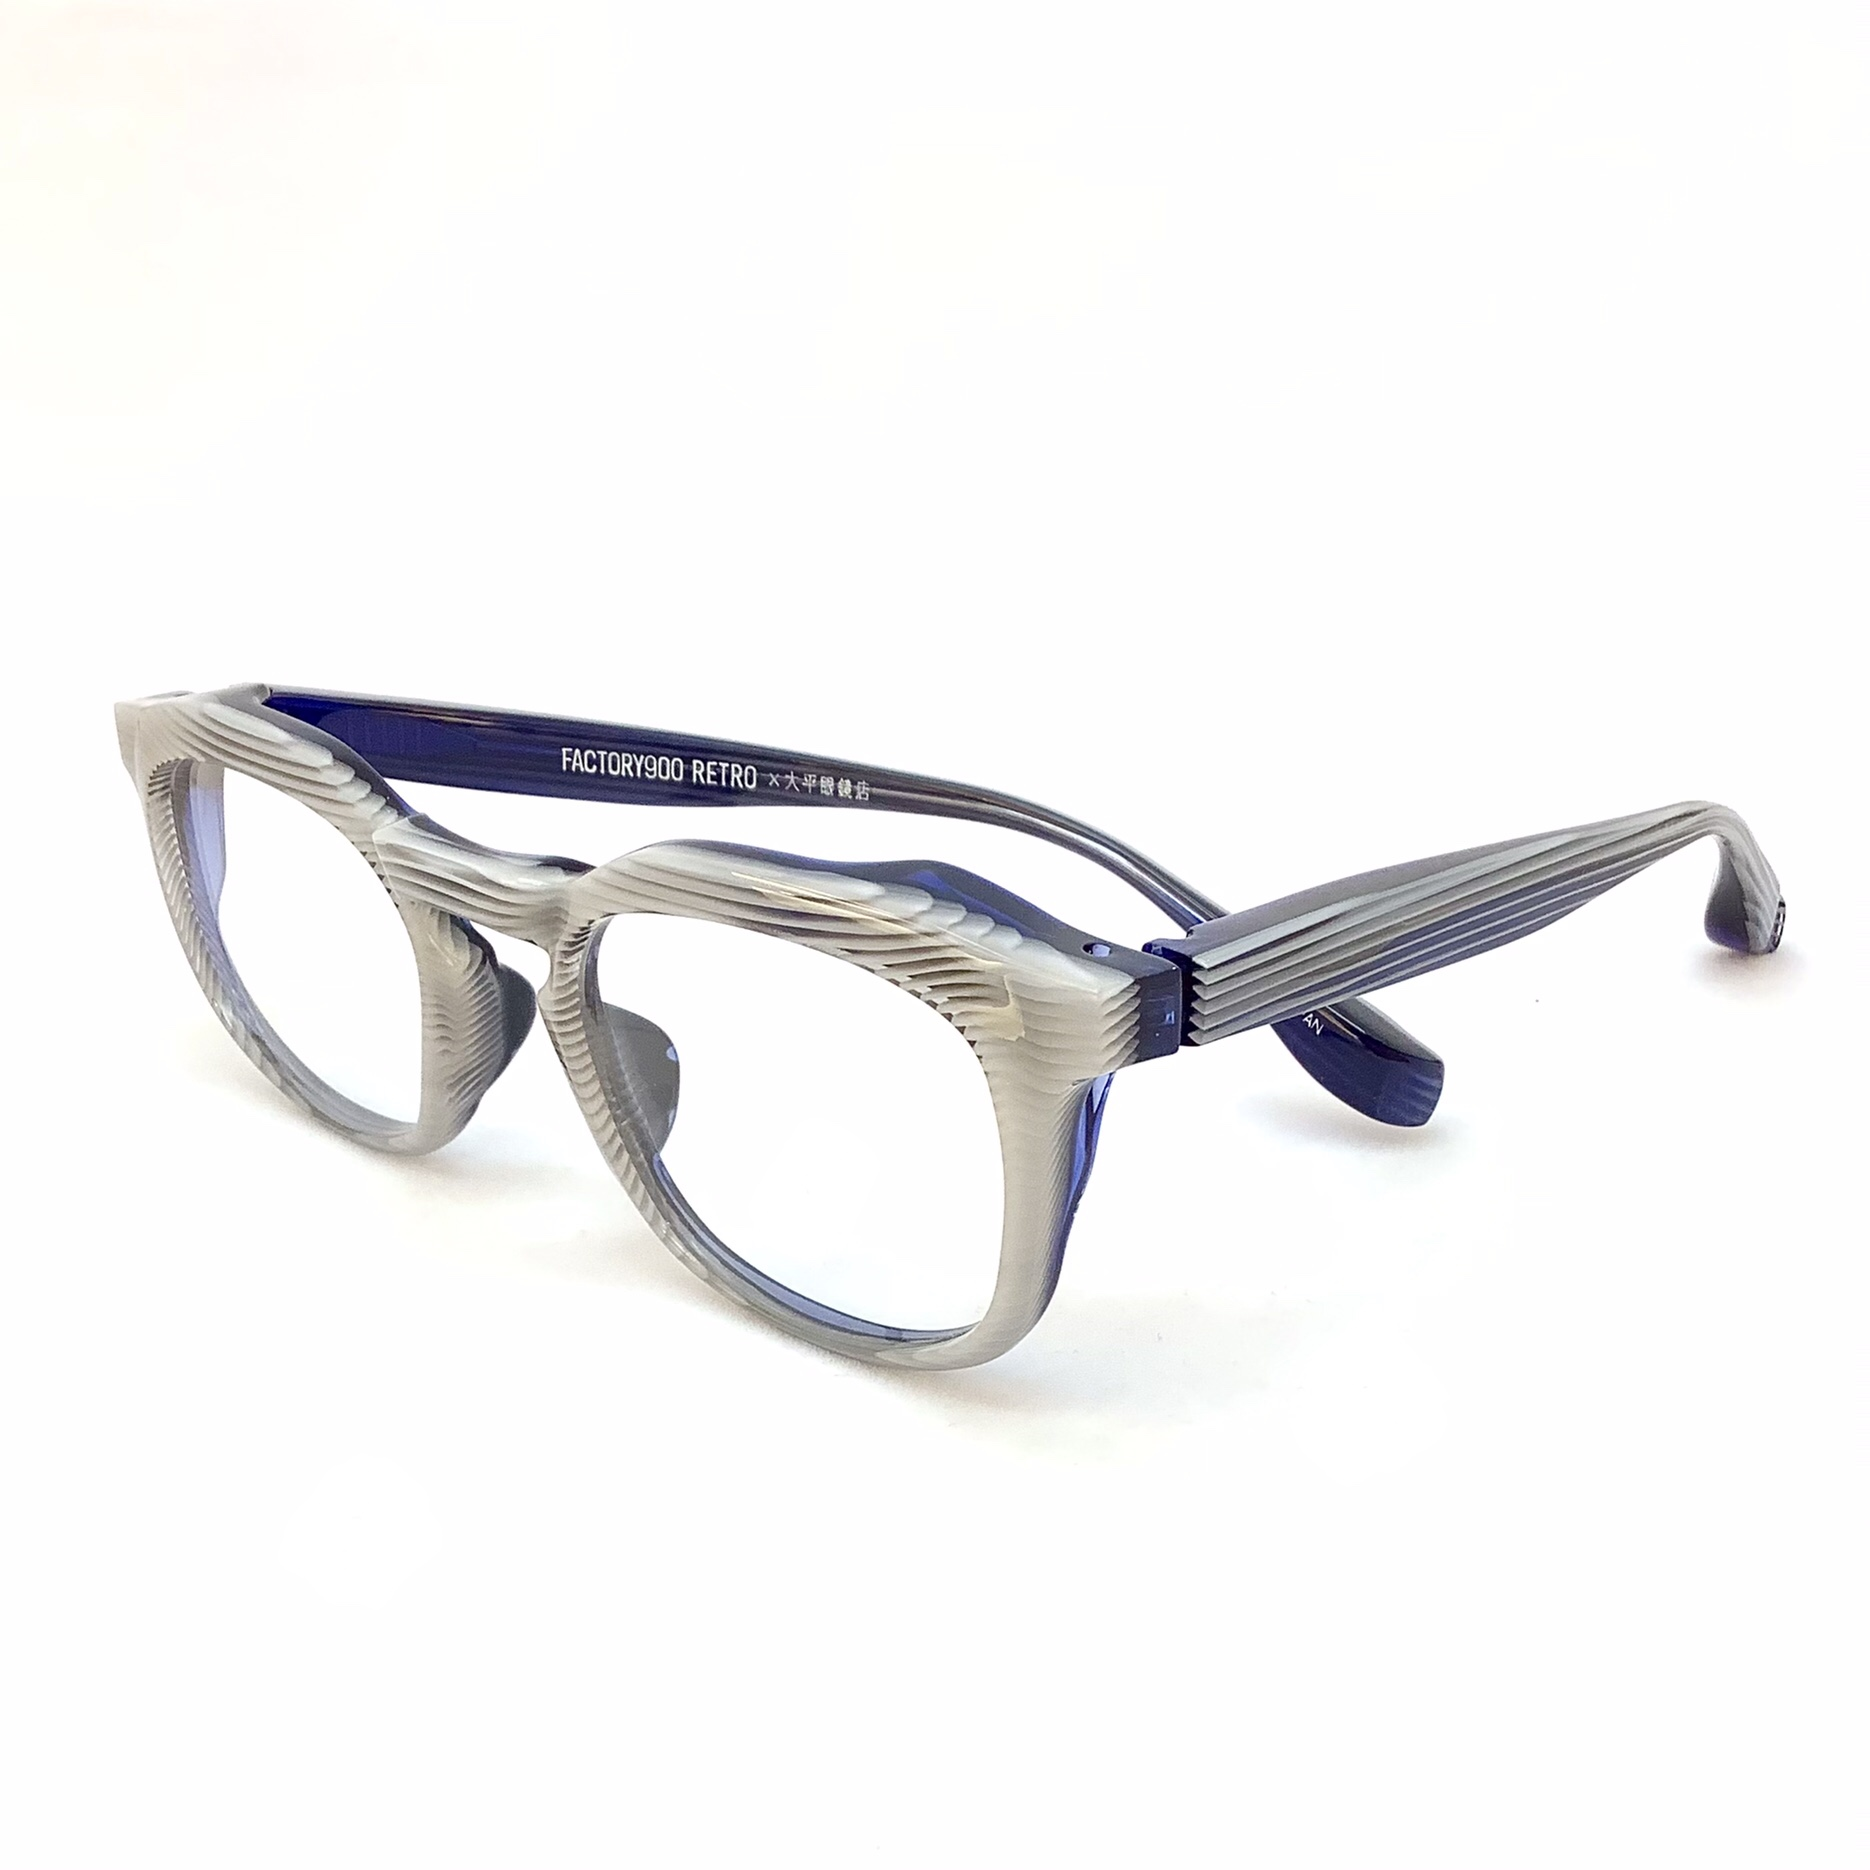 FACTORY 900 RETRO<ファクトリー900 レトロ>大平眼鏡店限定モデル(限定カラー)